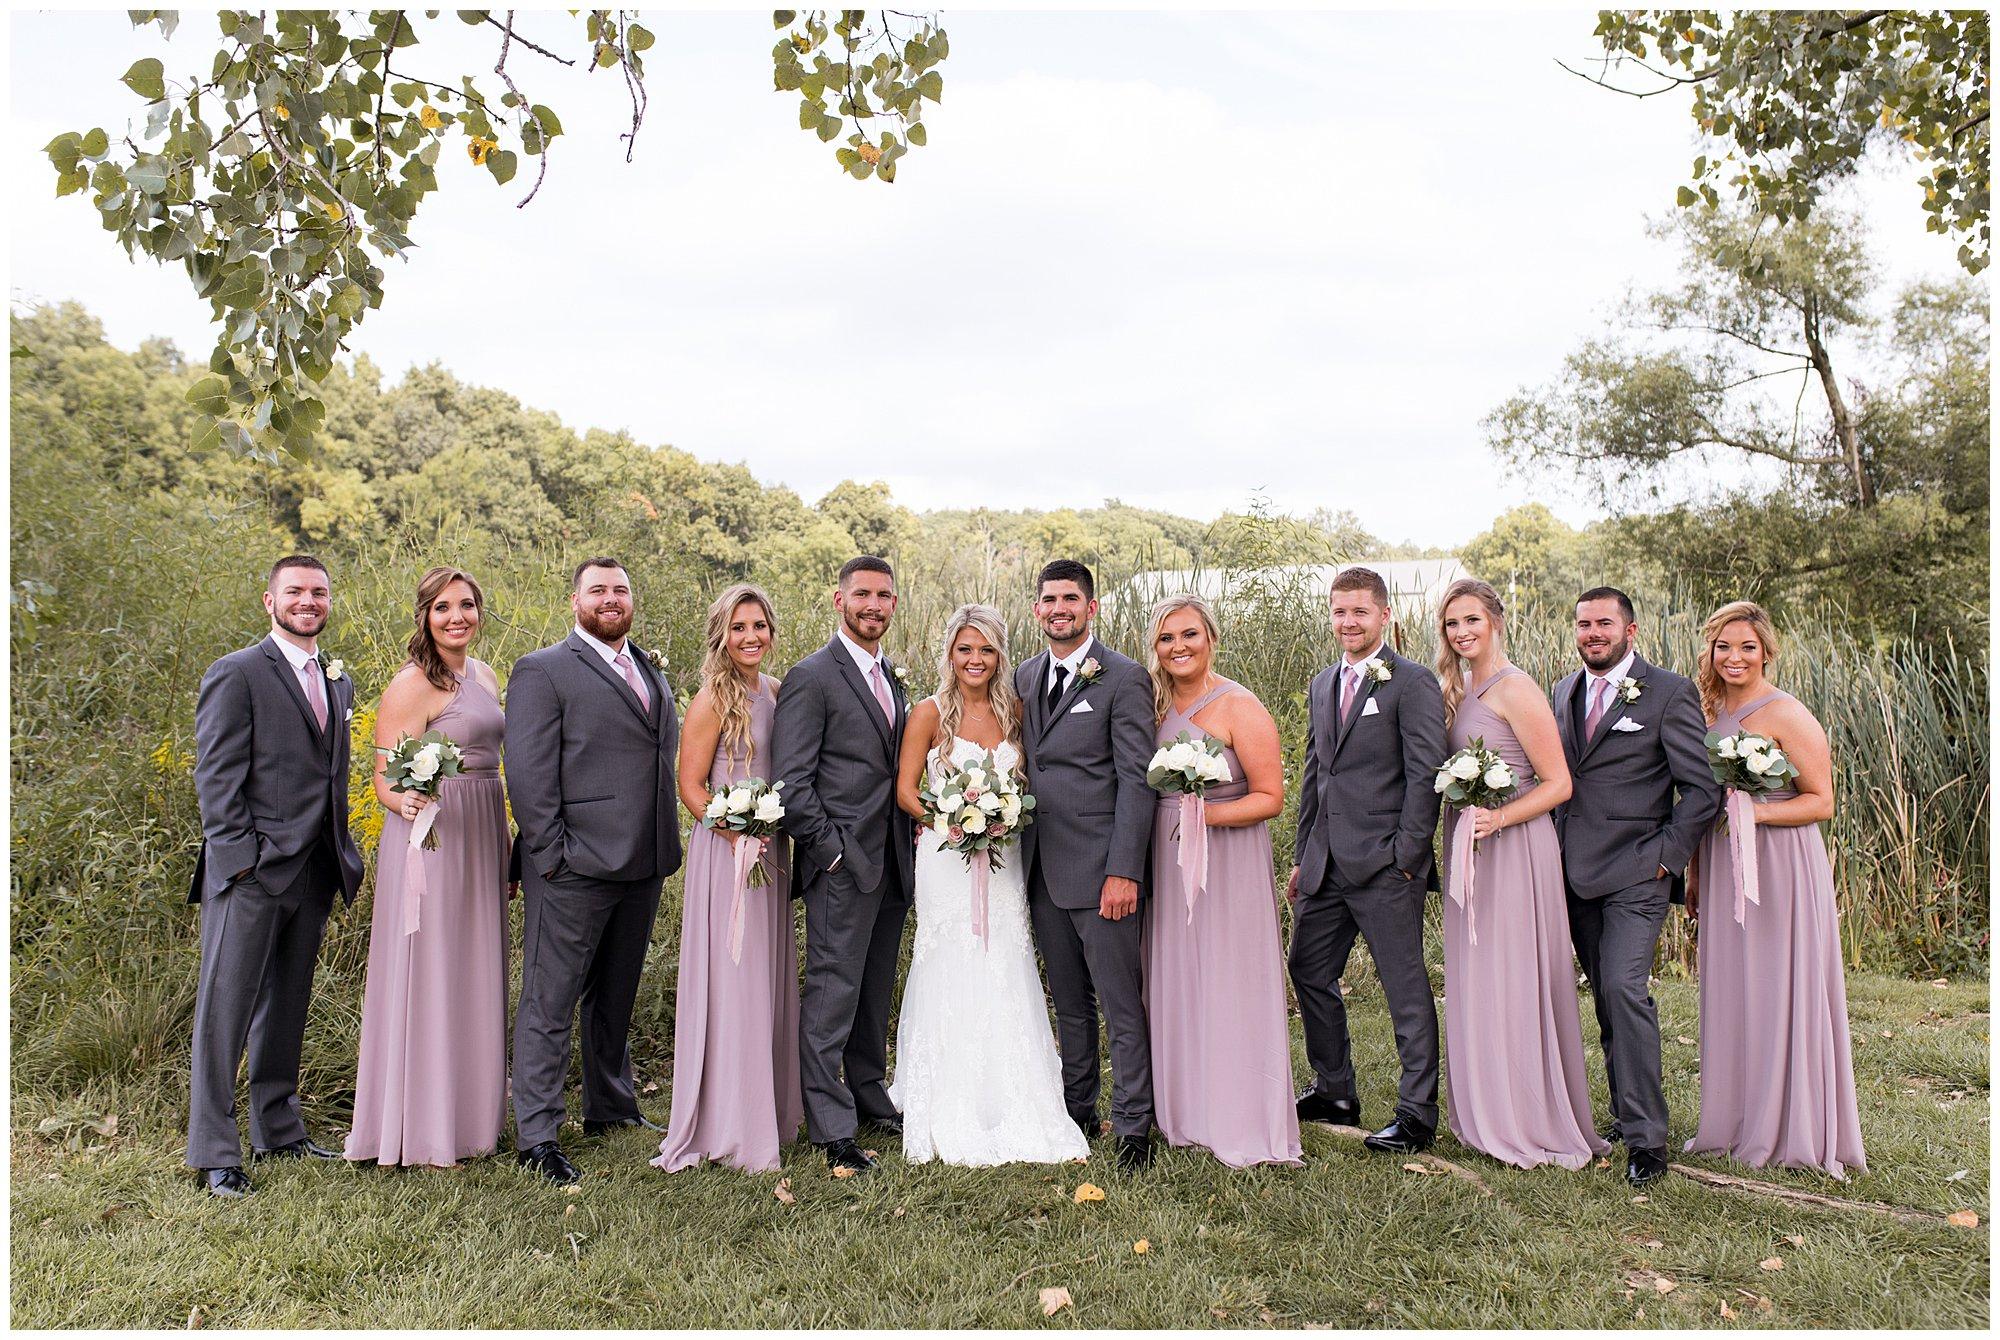 wedding party portraits at Union 12 wedding venue in Fort Wayne